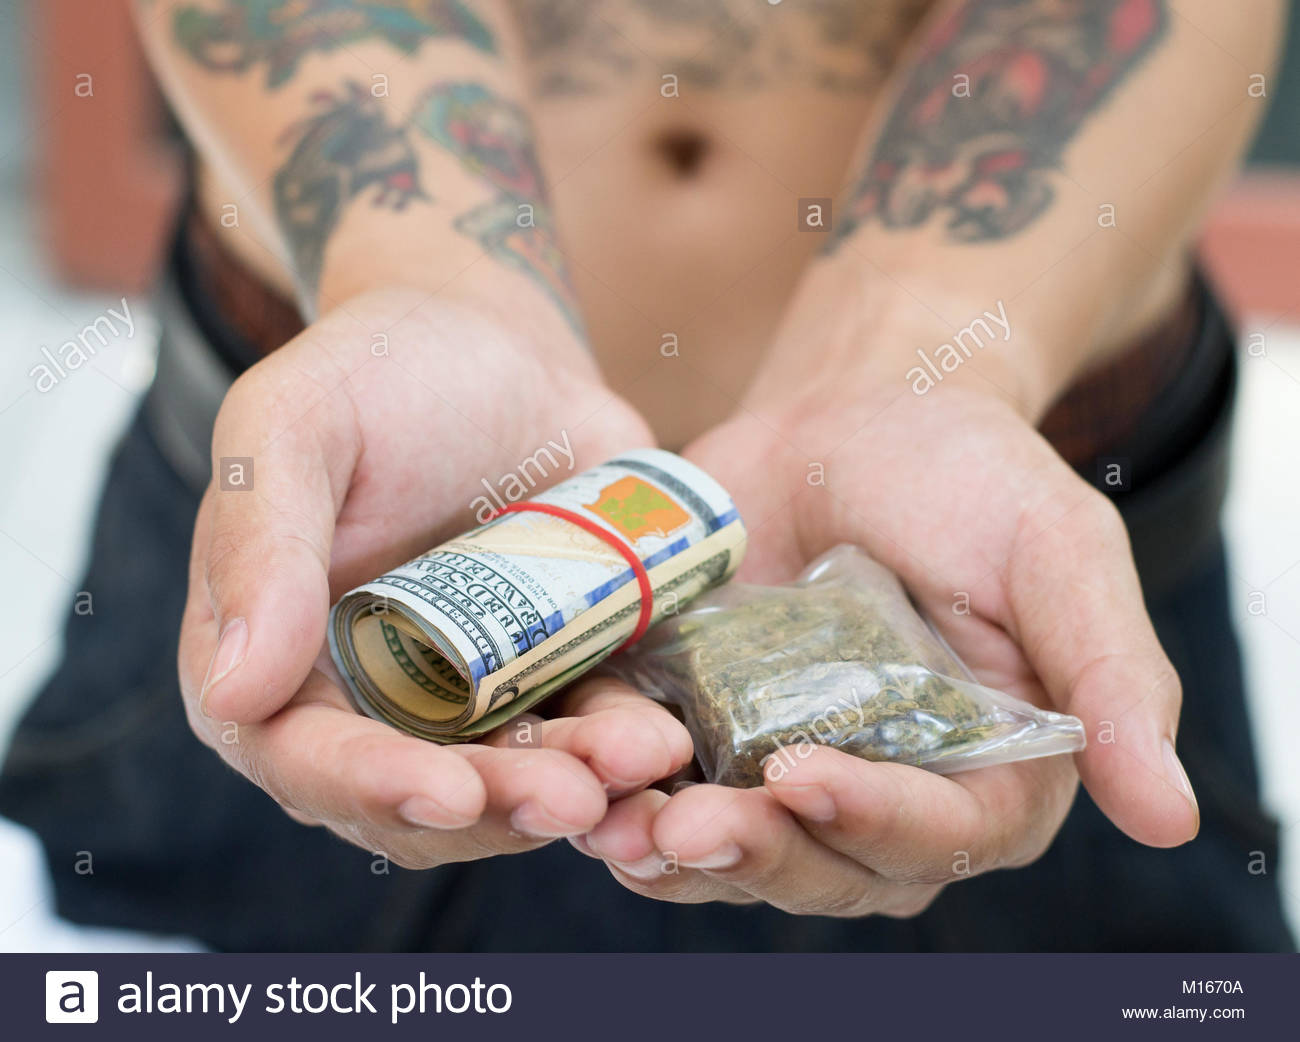 Drug dealer asking for money for narcotics and drugs. Drugs concept. - Stock Image